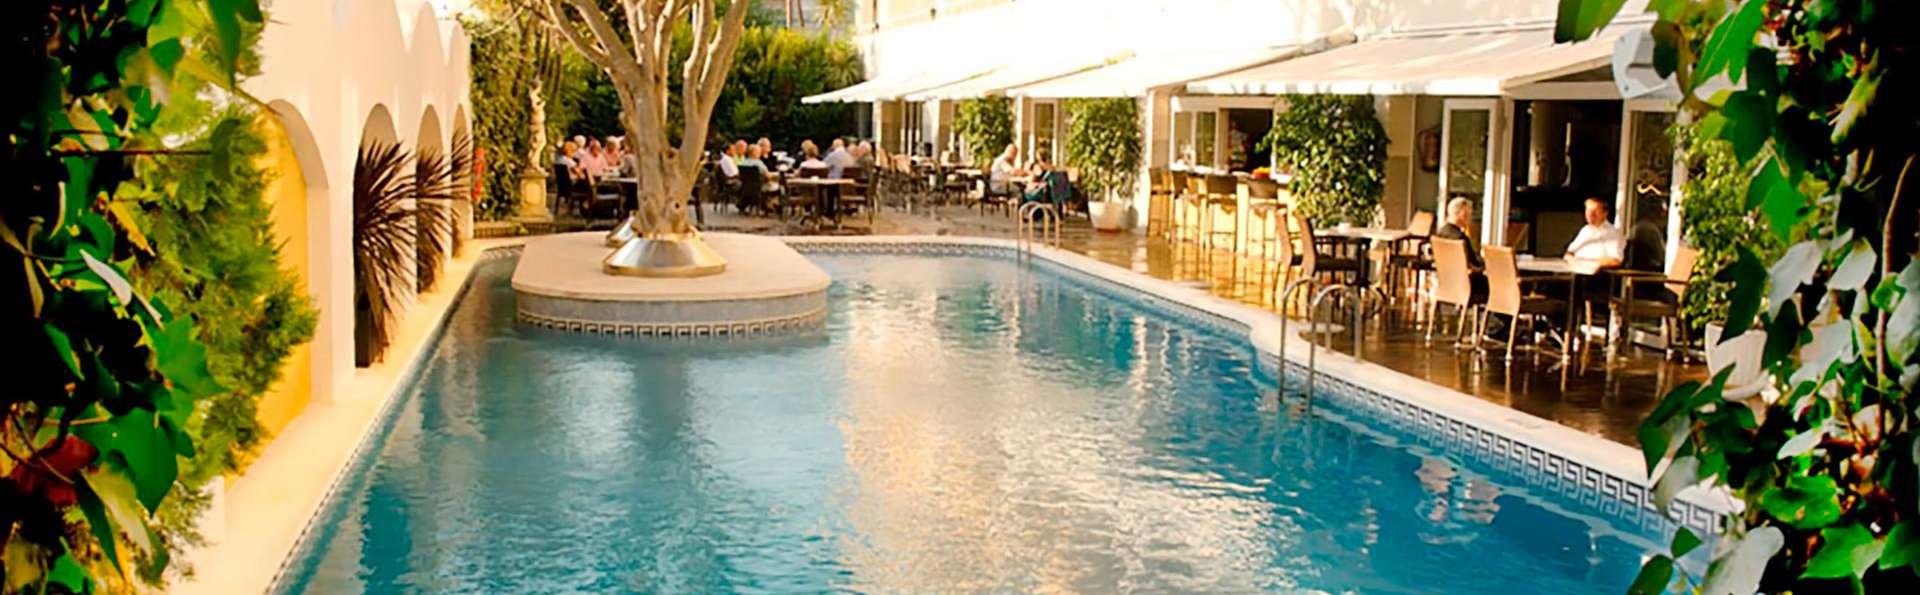 BondiaHotels Augusta Club & Spa +16 - EDIT_POOL_05.jpg